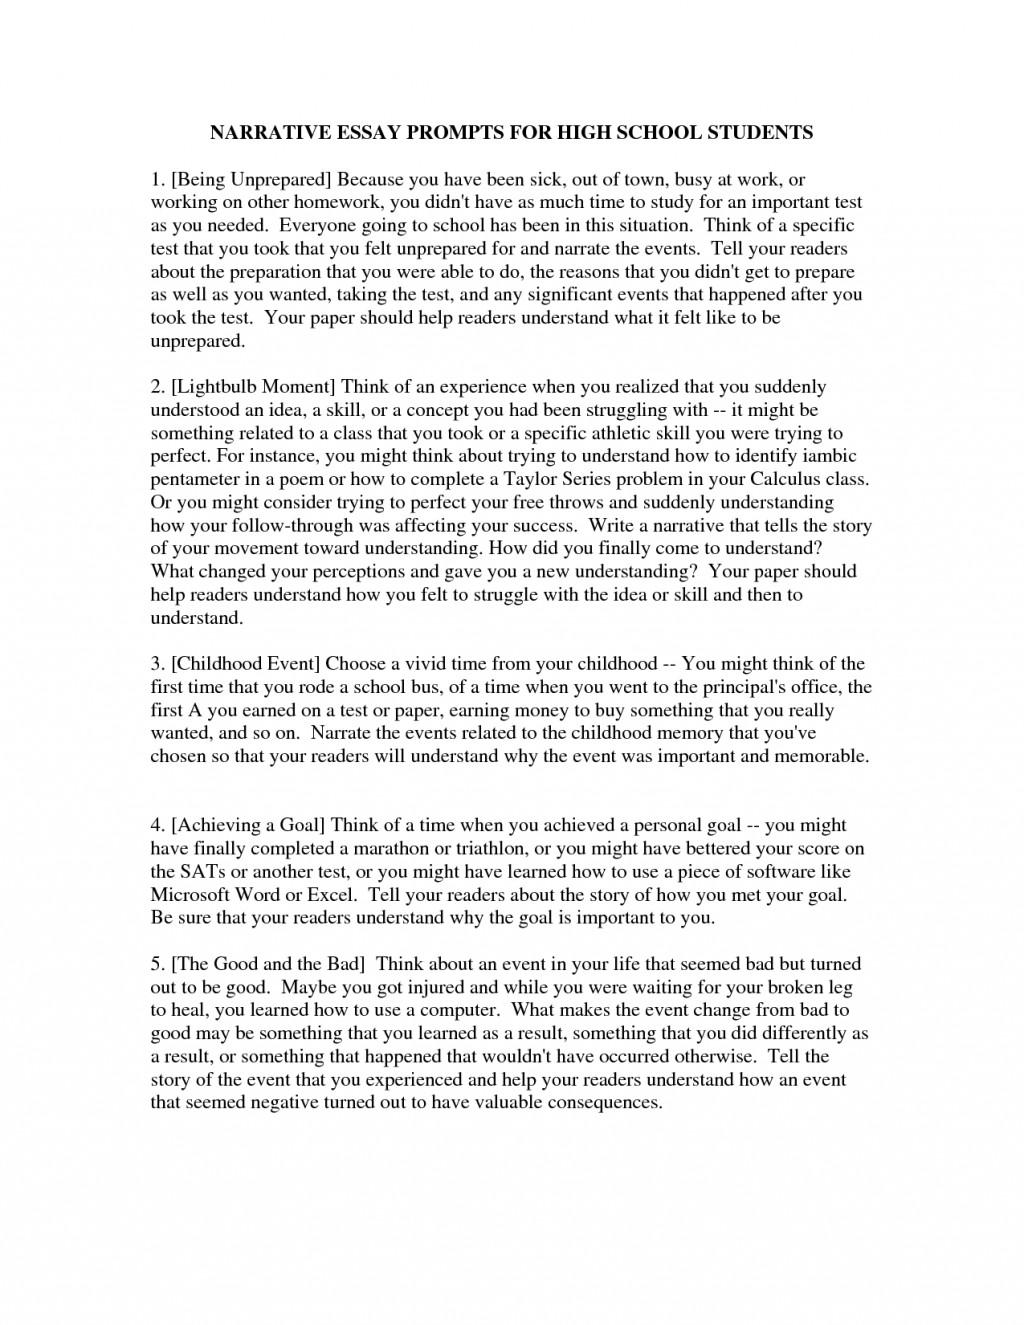 005 Narrative Descriptive Essay Example Autobiographical Prompts Essays Examples L Impressive Pdf About Earthquake Outline Large